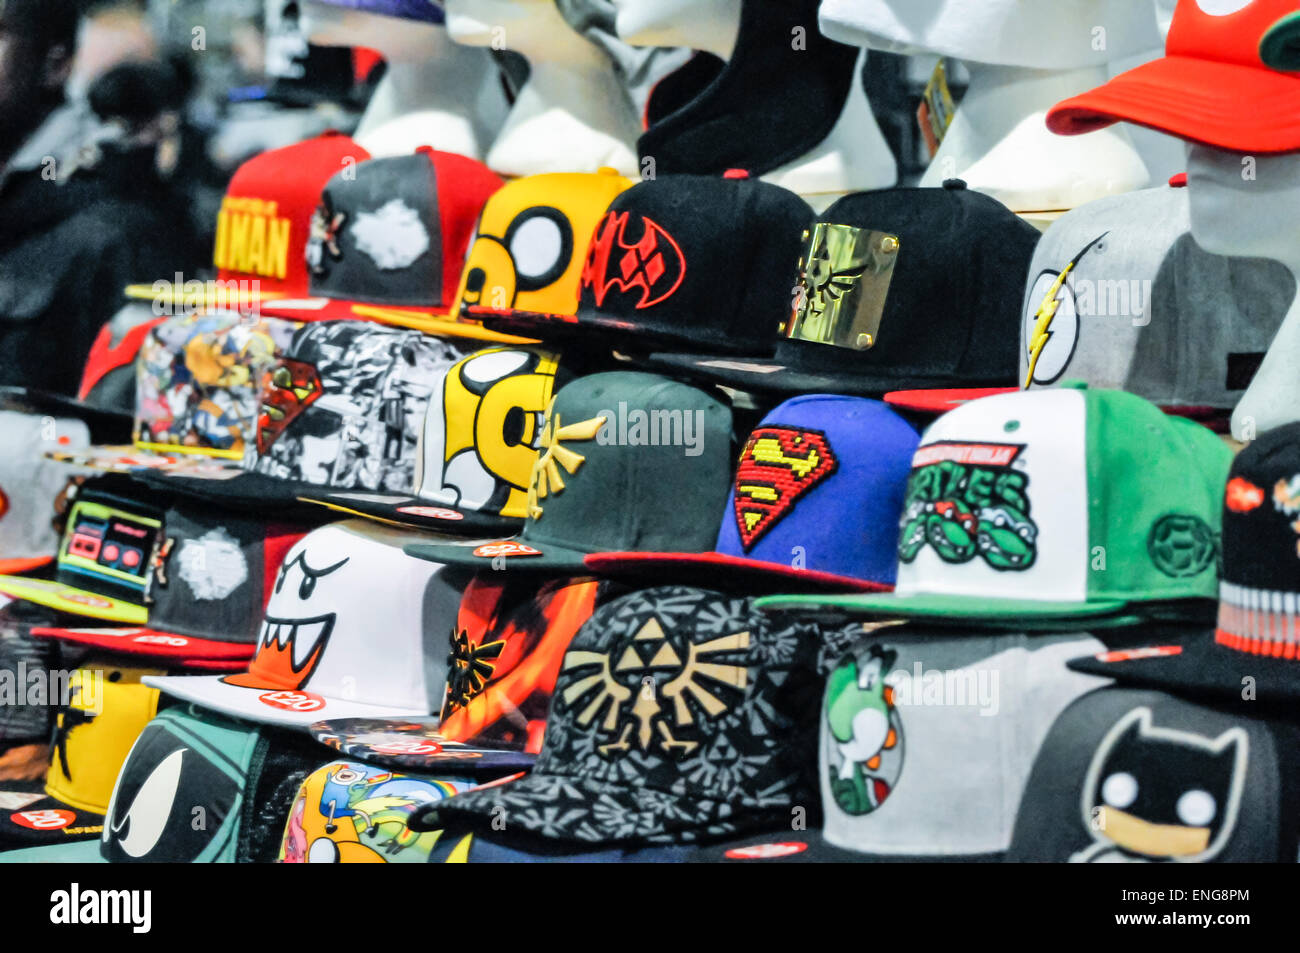 Baseball caps with comic book, manga and sci-fi logos - Stock Image